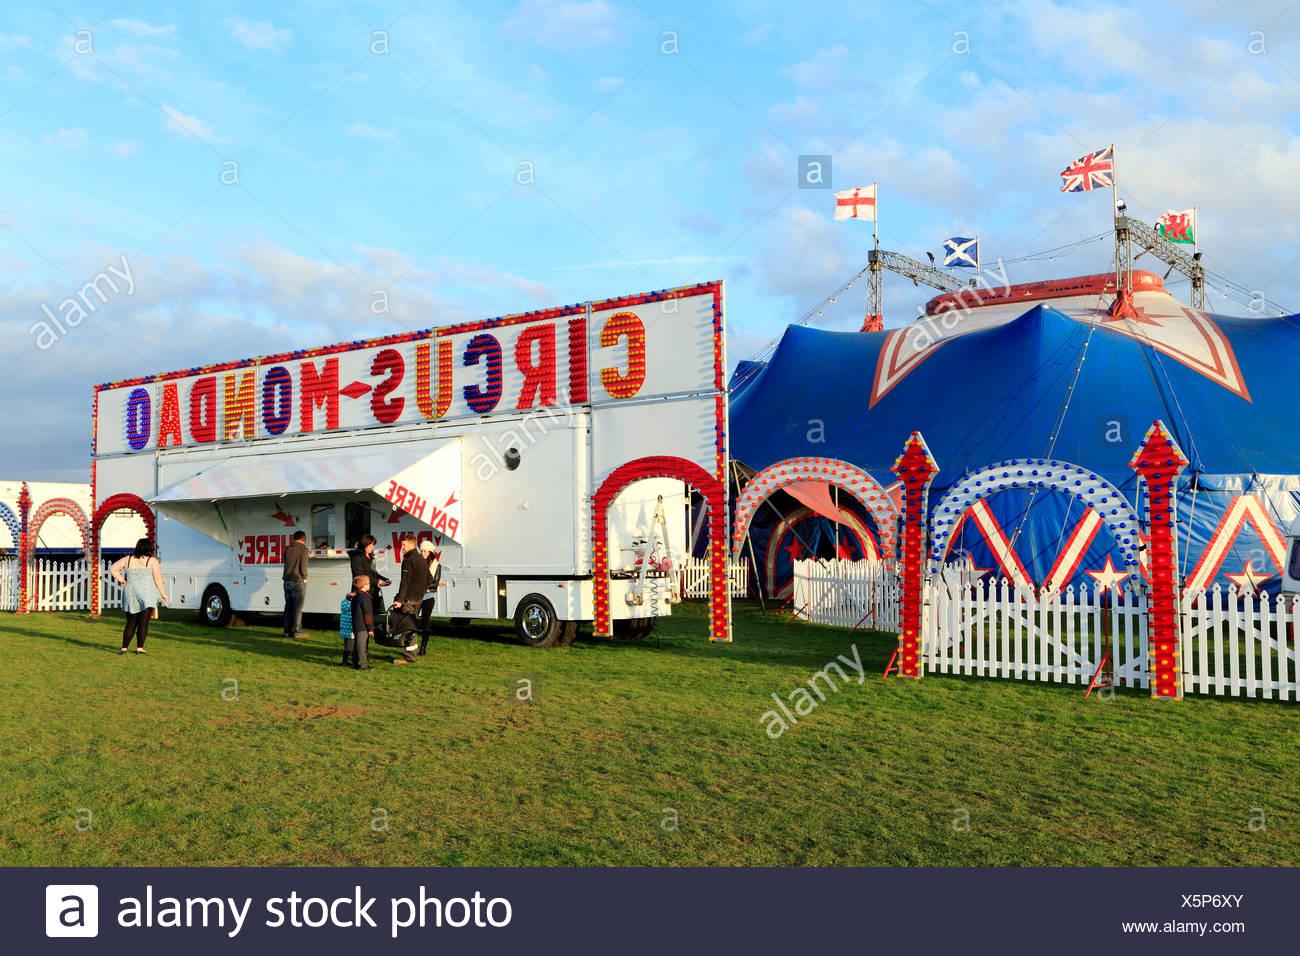 Circus Mondao, travelling UK circus show shows Big Top Kings Lynn England - Stock Image